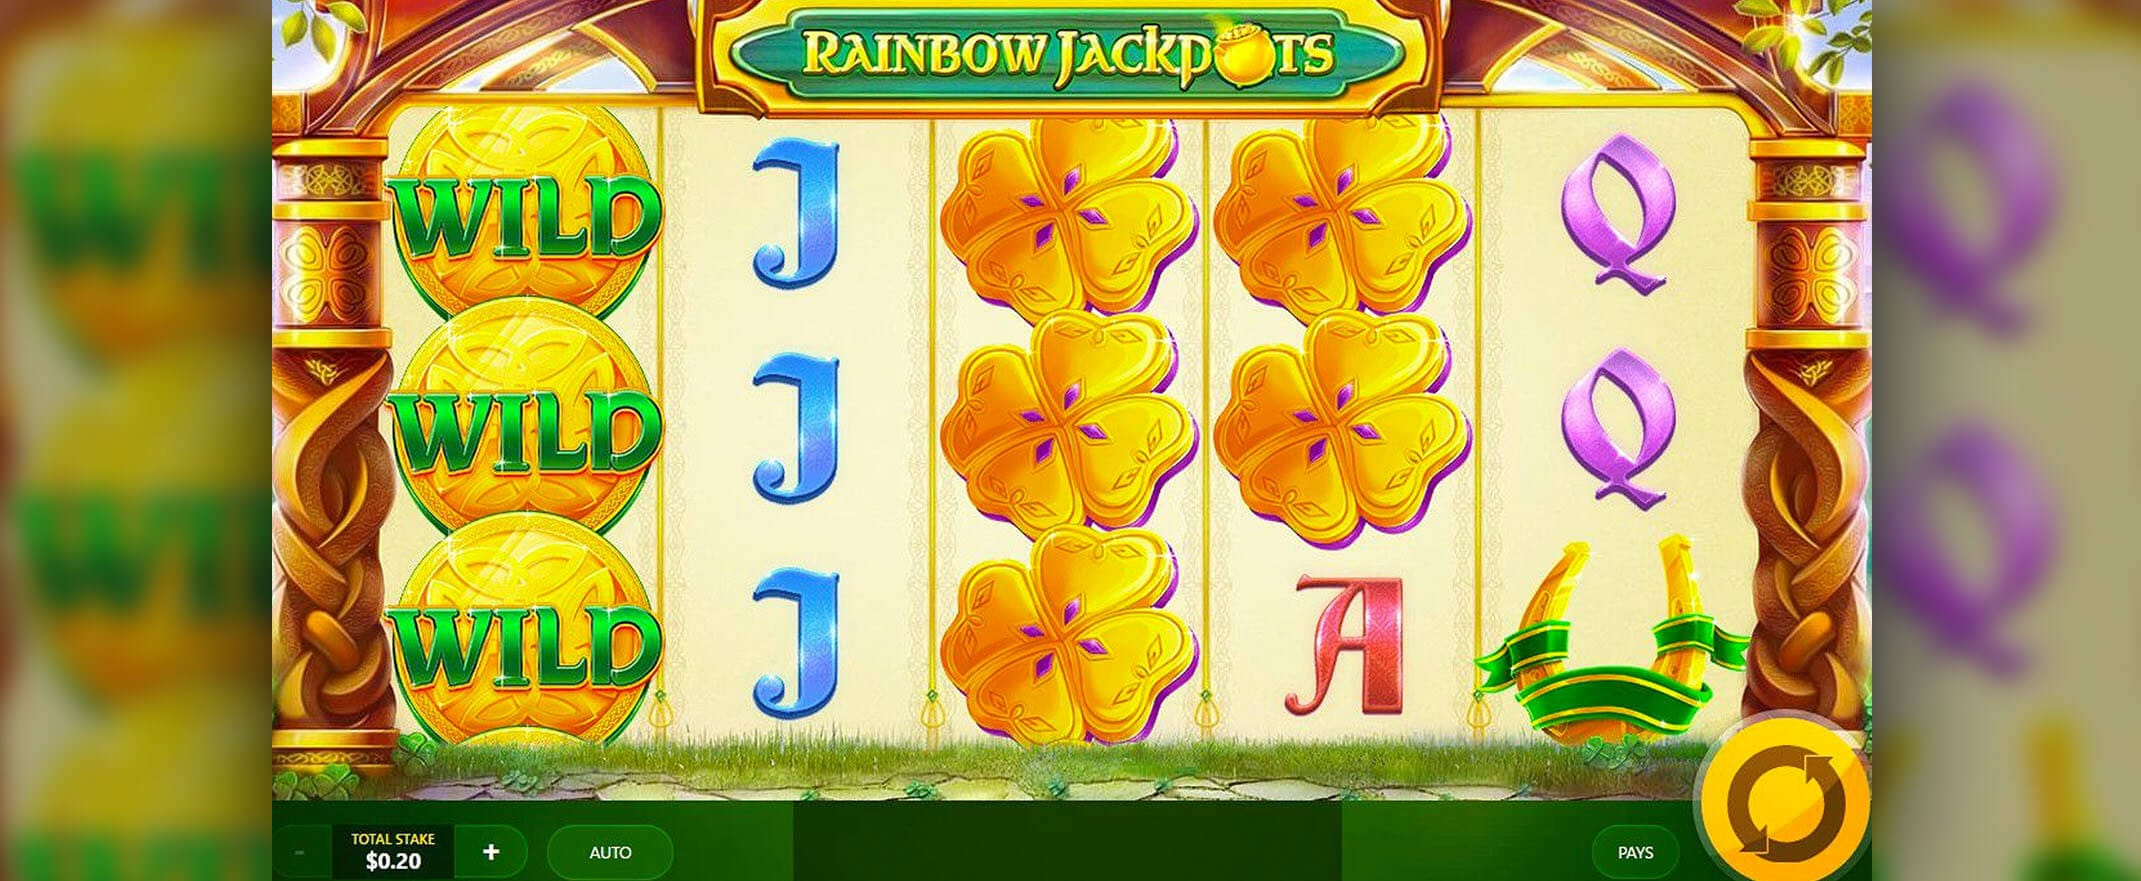 Rainbow Jackpots Slots Online